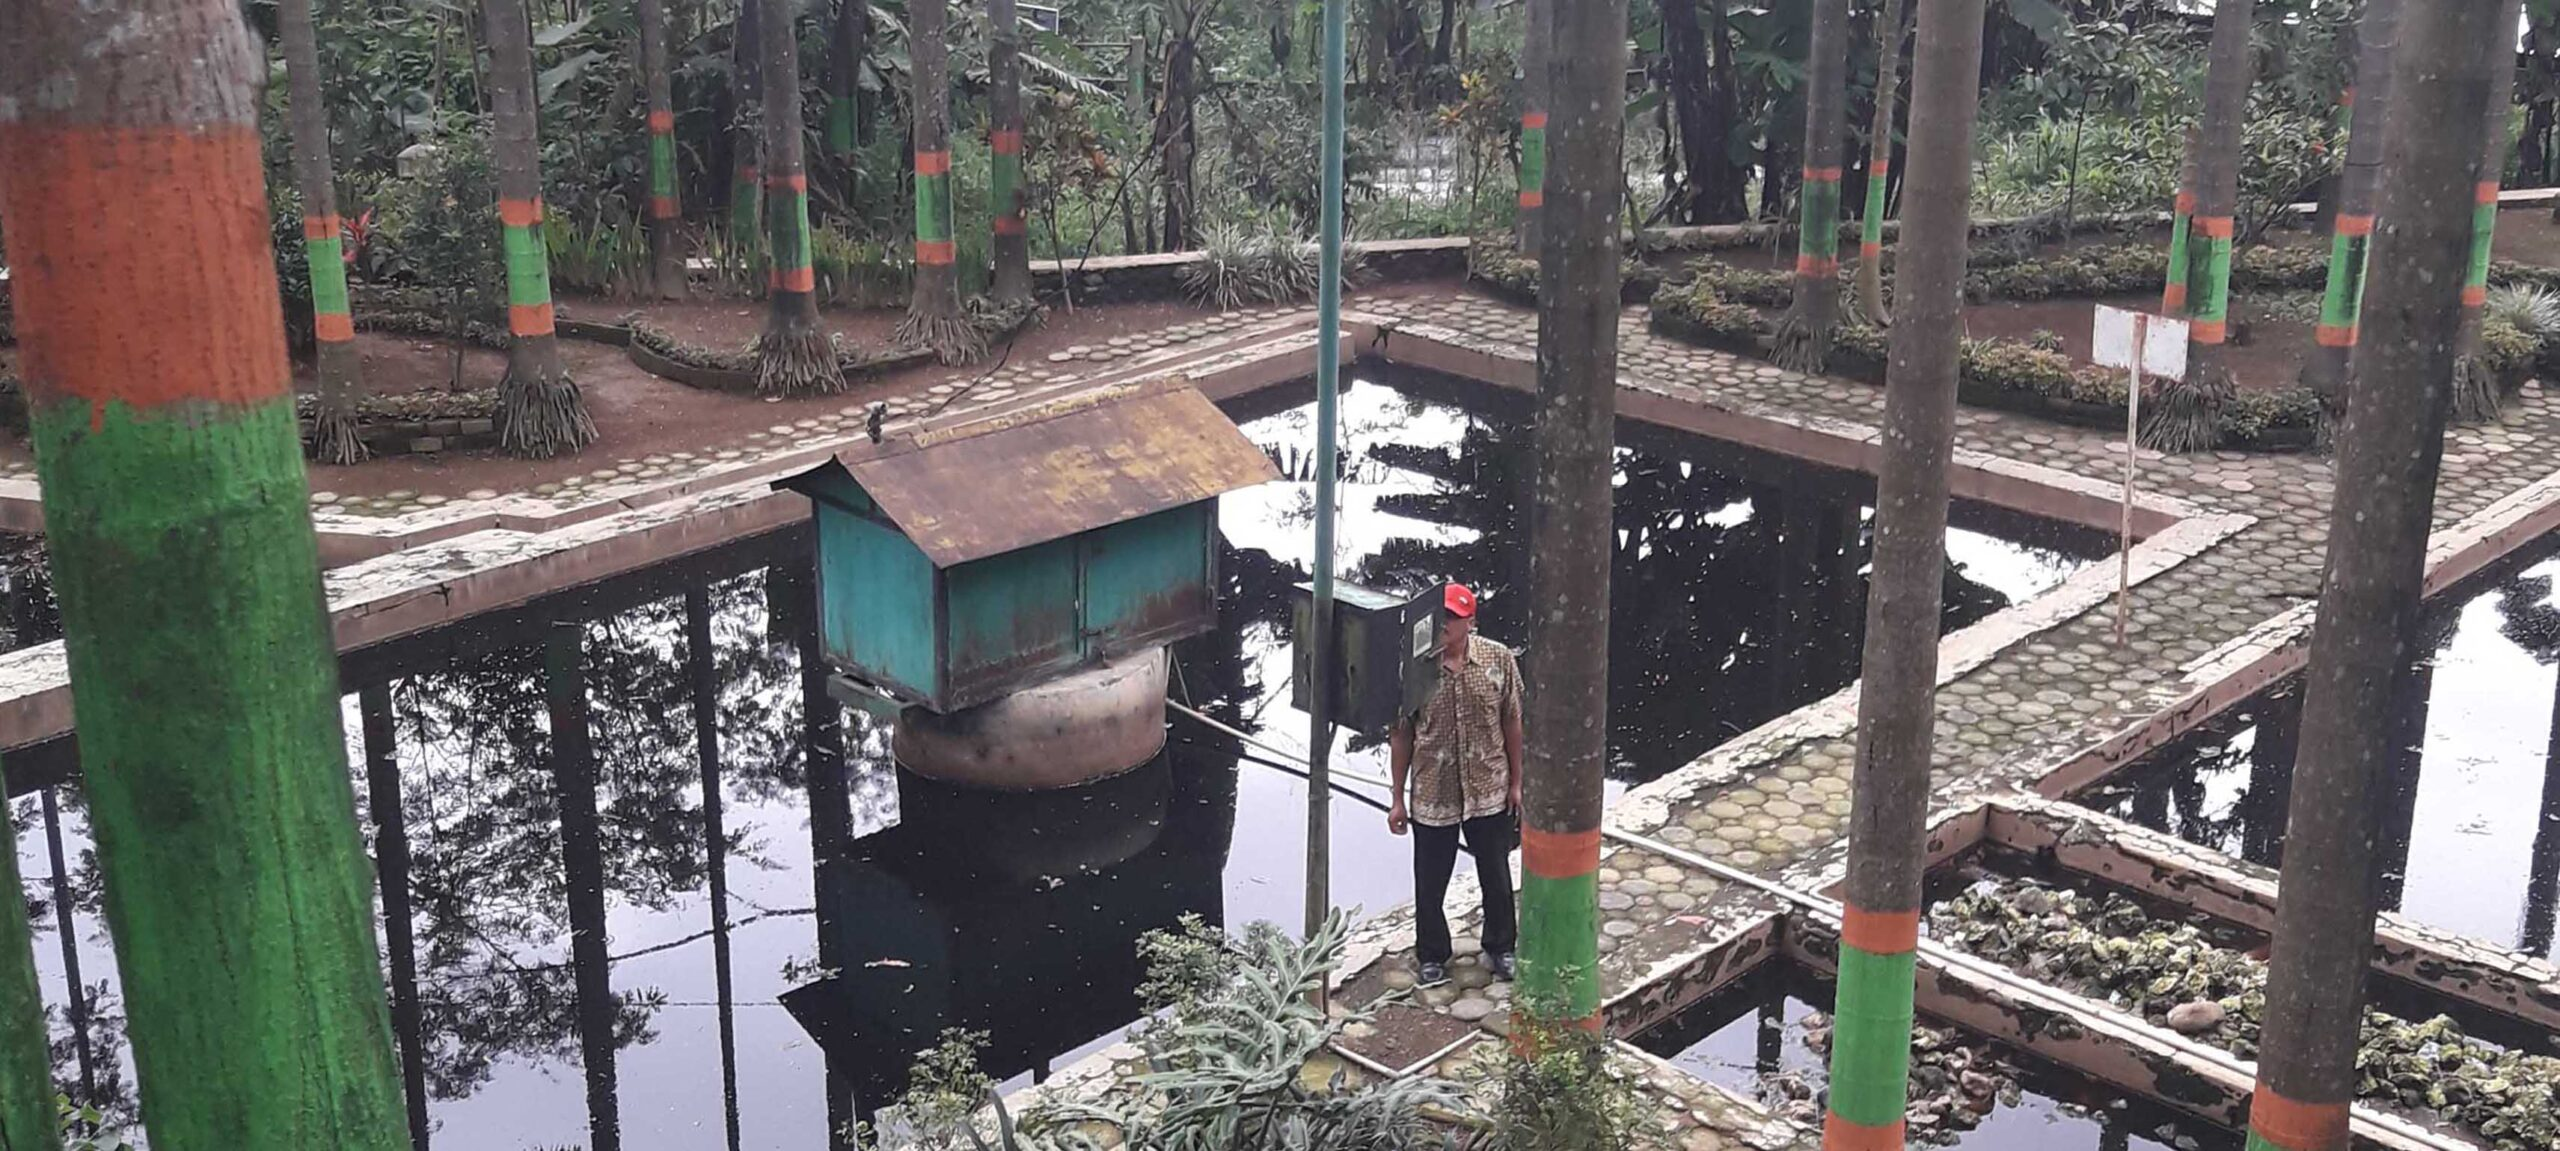 Sustainable Urban Development in Indonesia